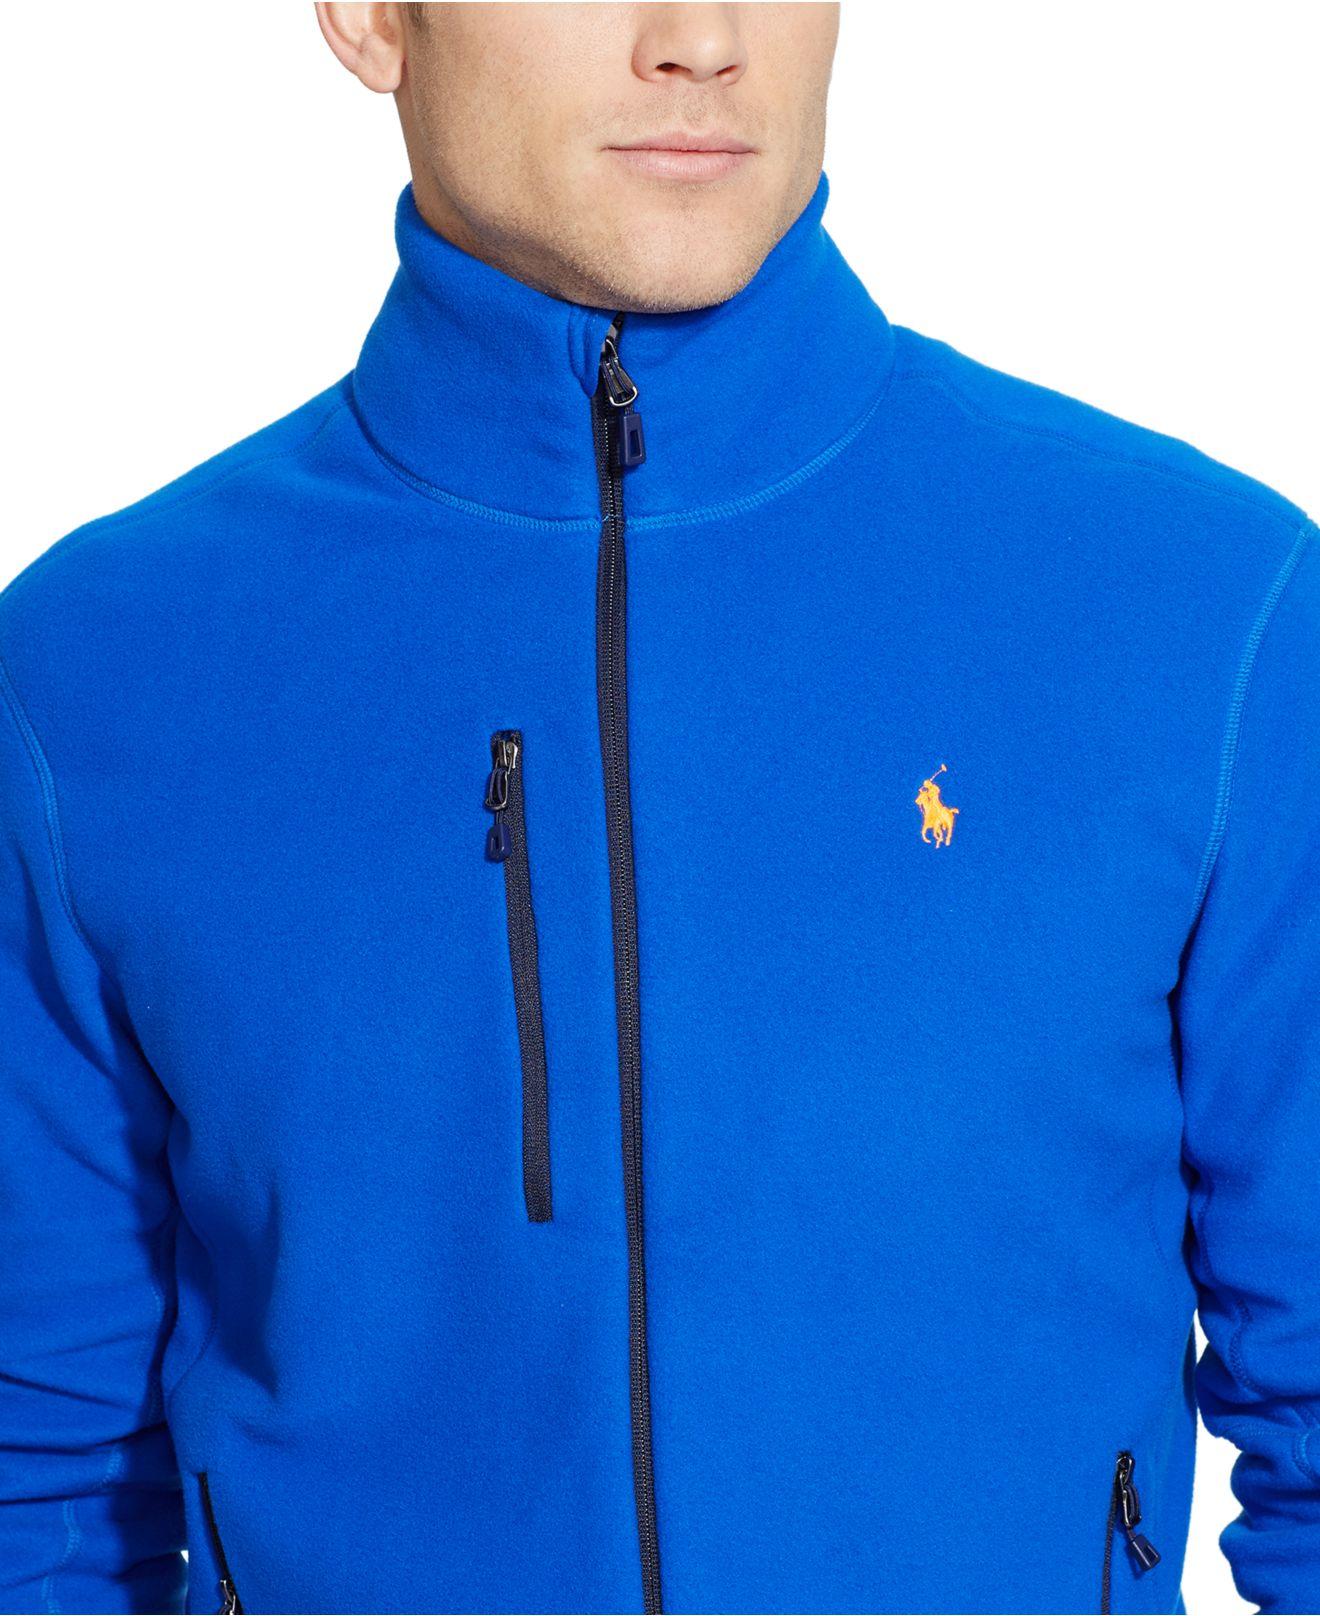 Polo ralph lauren Fleece Mockneck Jacket in Blue for Men | Lyst